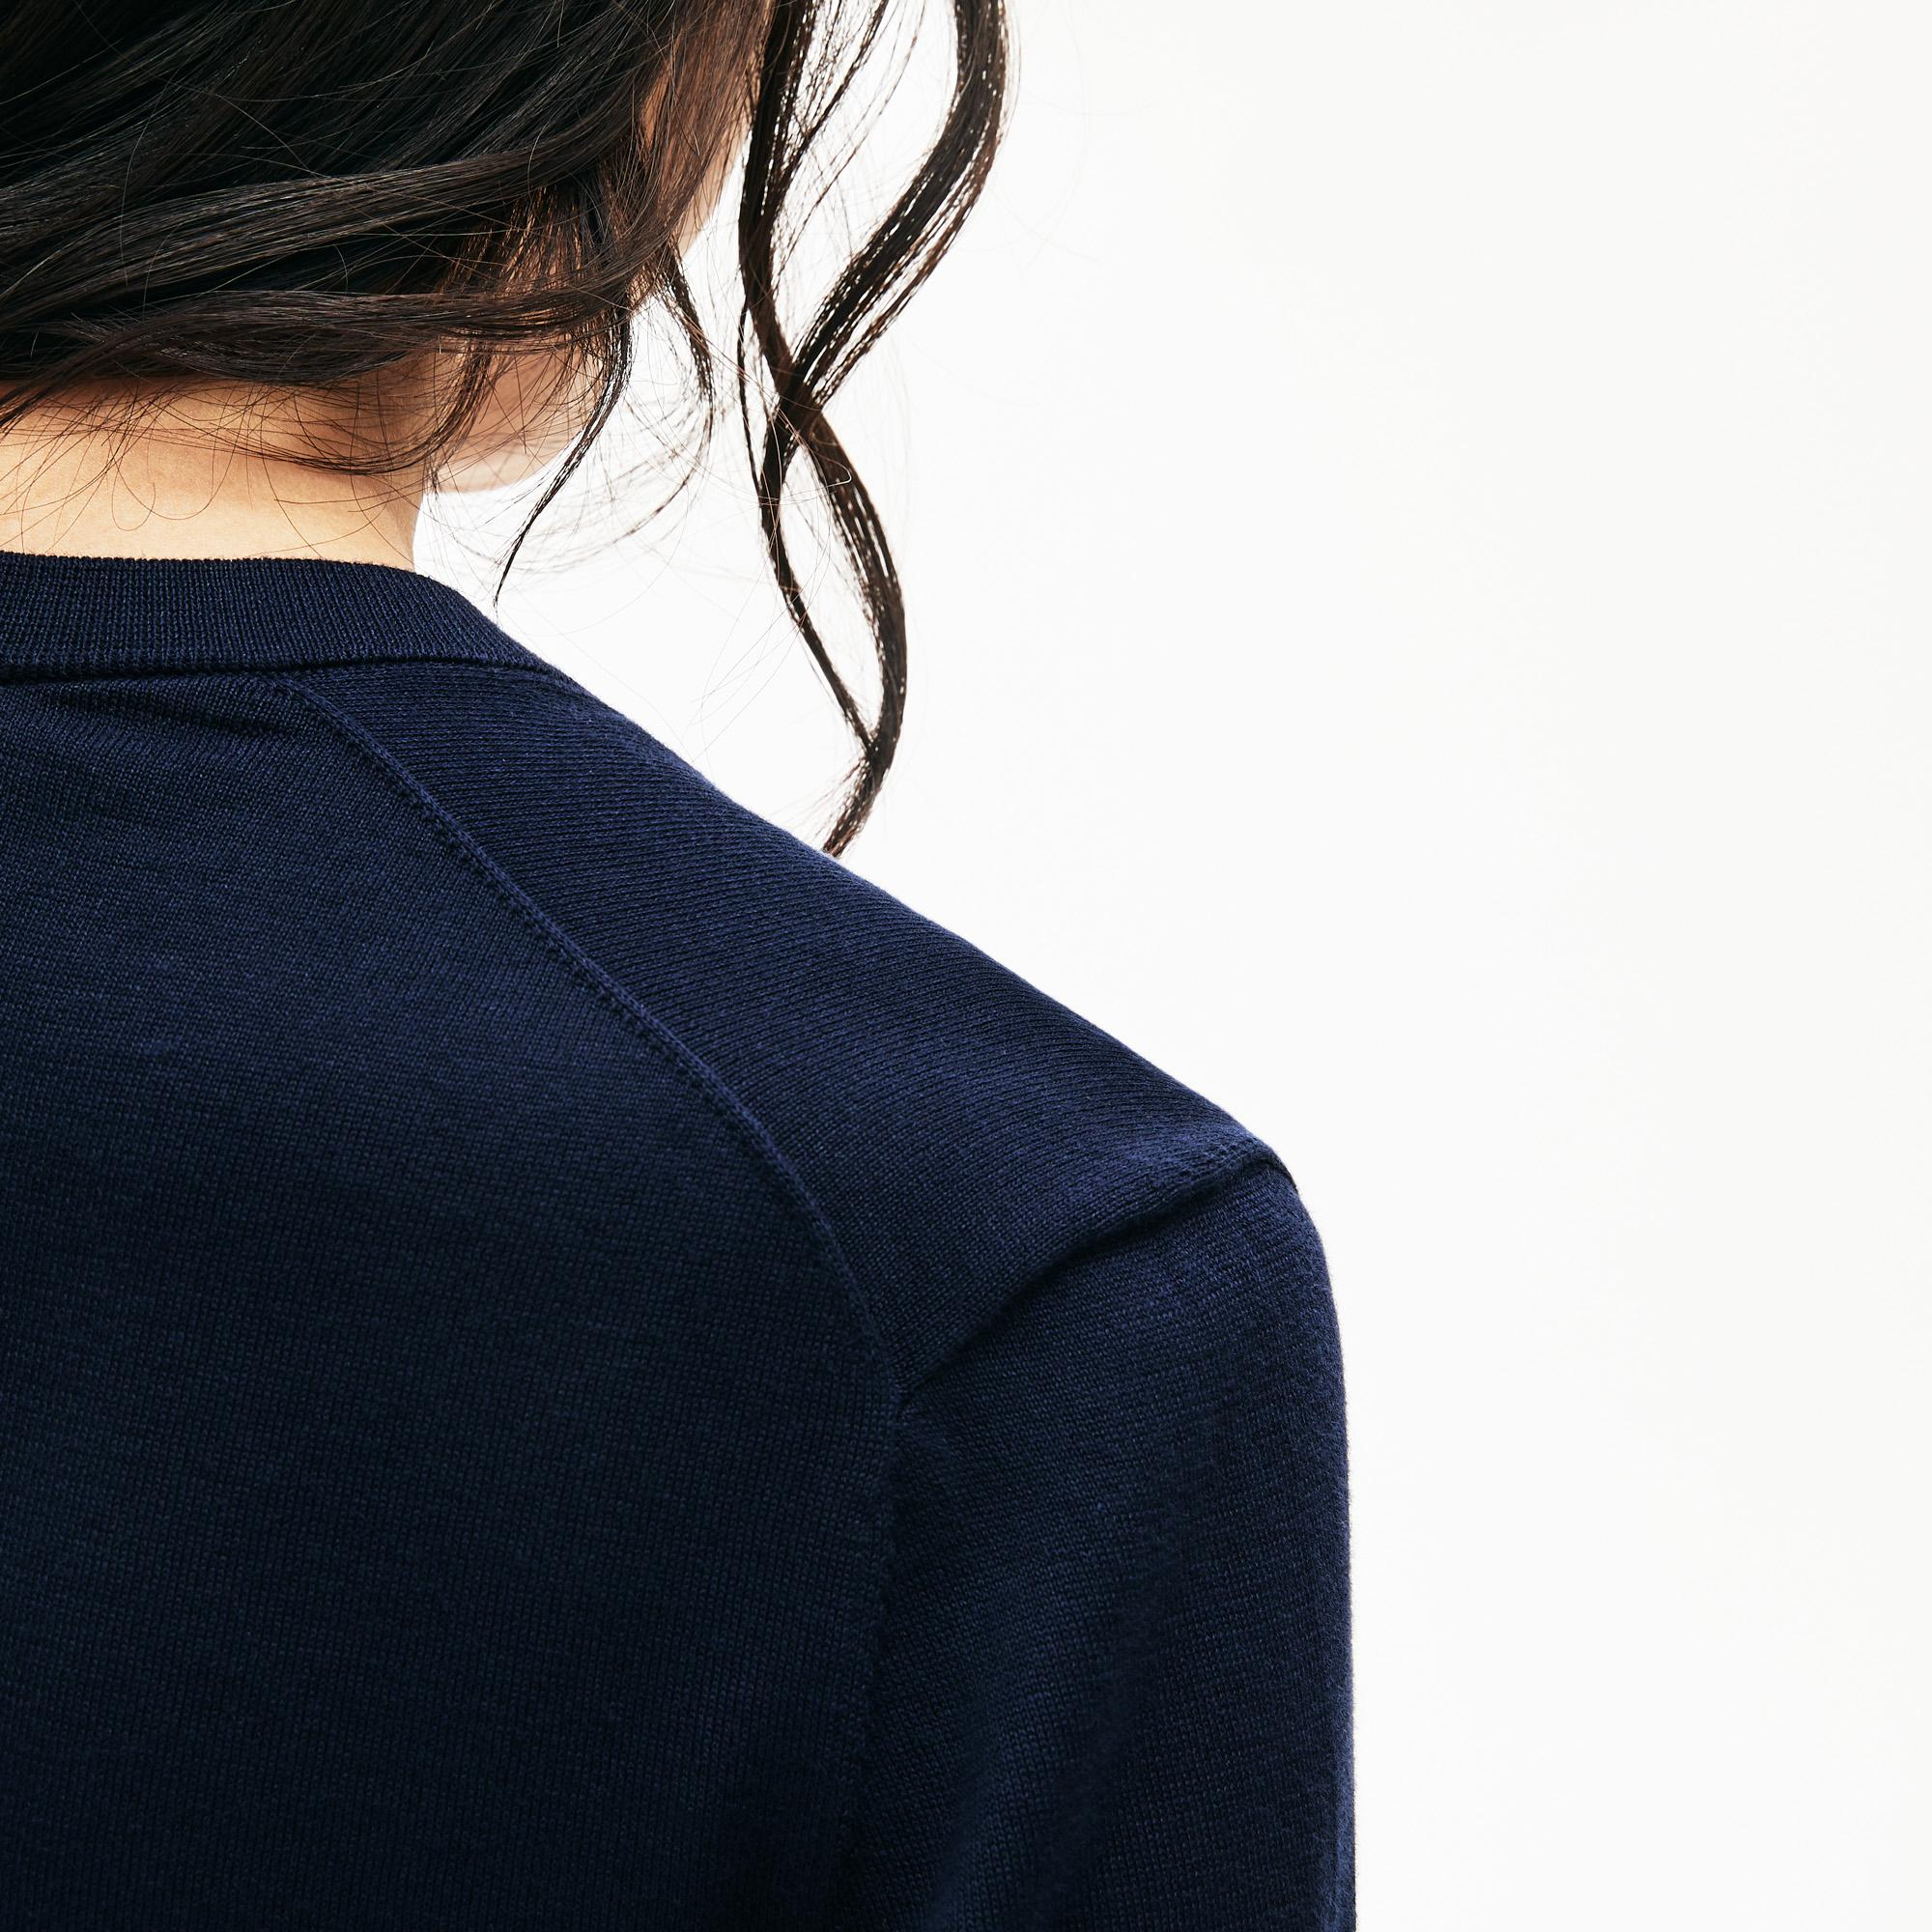 Lacoste Motion Kadın V Yaka Lacivert Triko Kazak